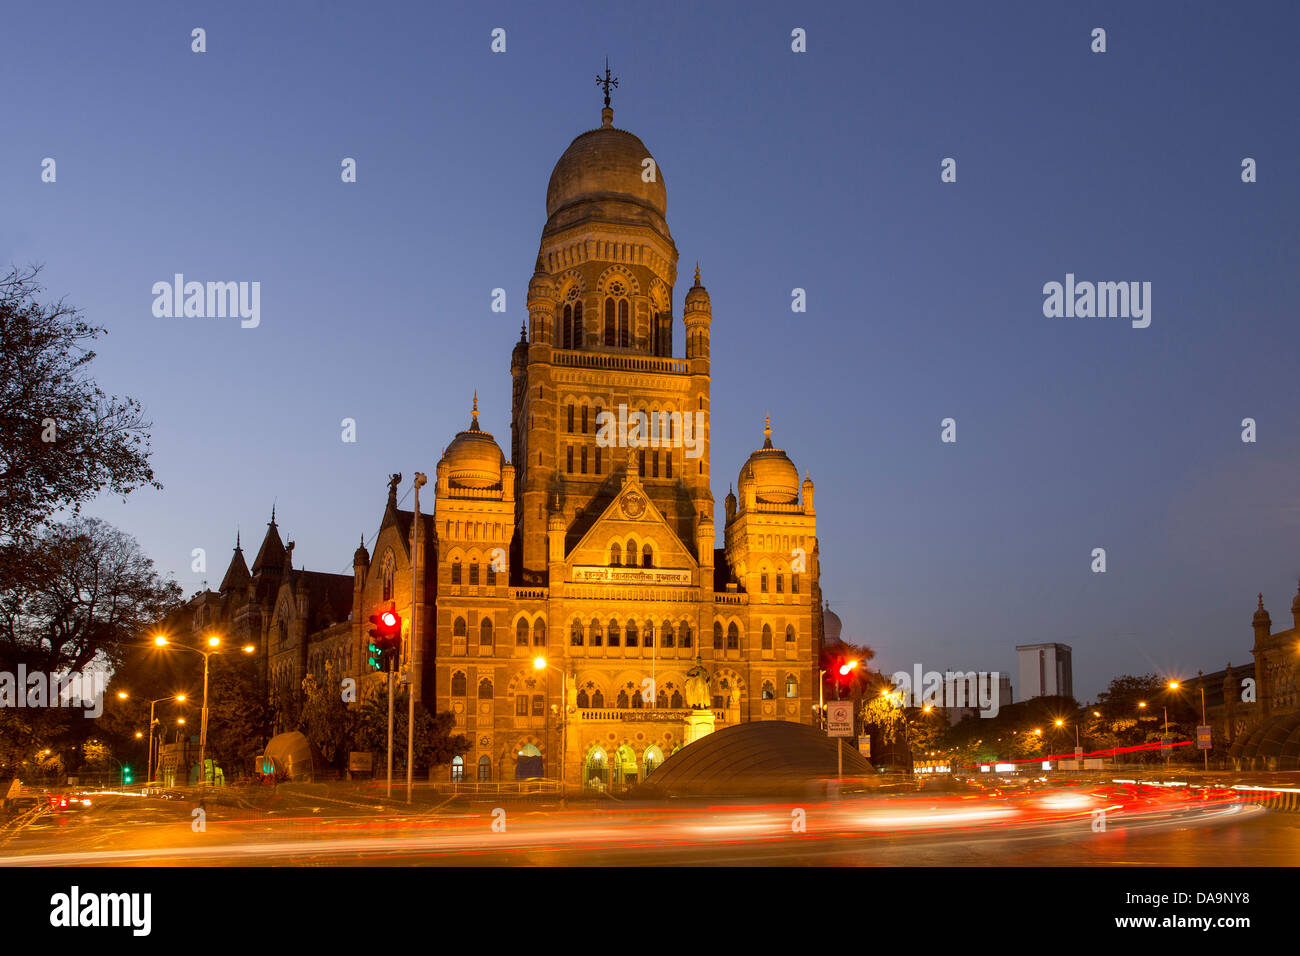 La India, Sur de India, Asia, Maharashtra, Mumbai, Bombay, Ciudad Dadabhai Naoroji Road, la Corporación Municipal, Imagen De Stock